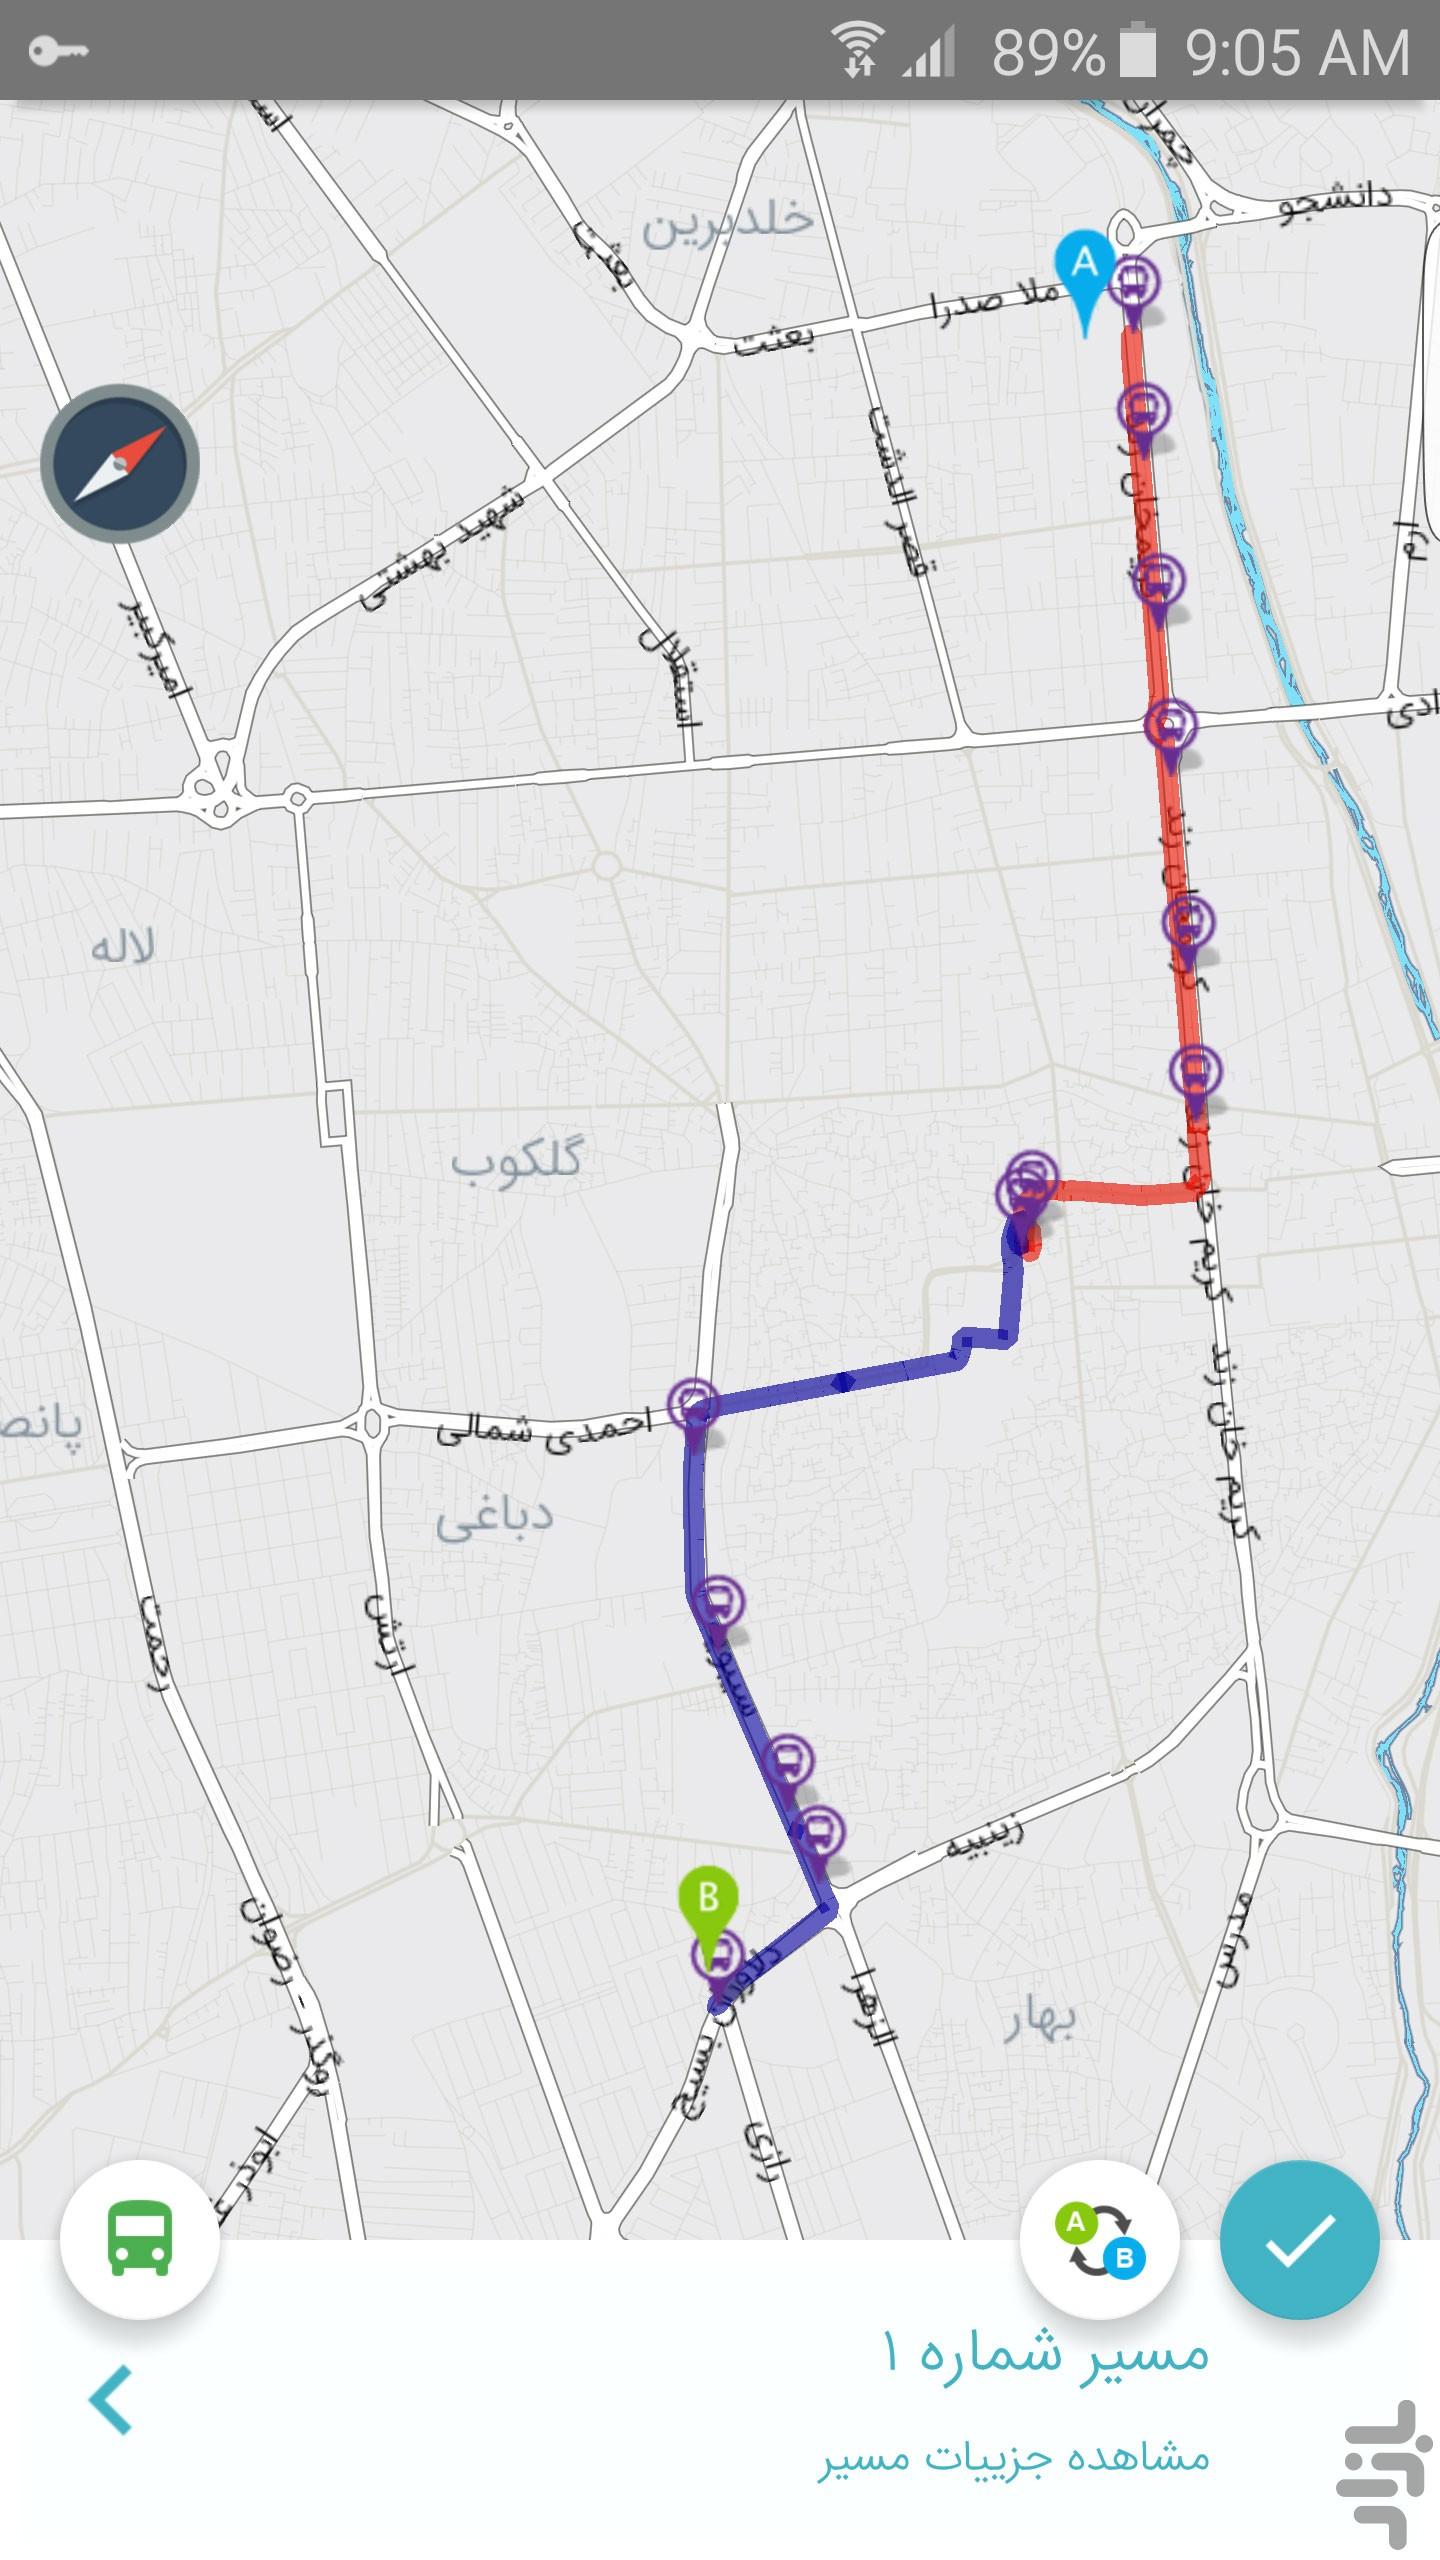 کرایه خانه مبله روزانه شیراز کد-2324